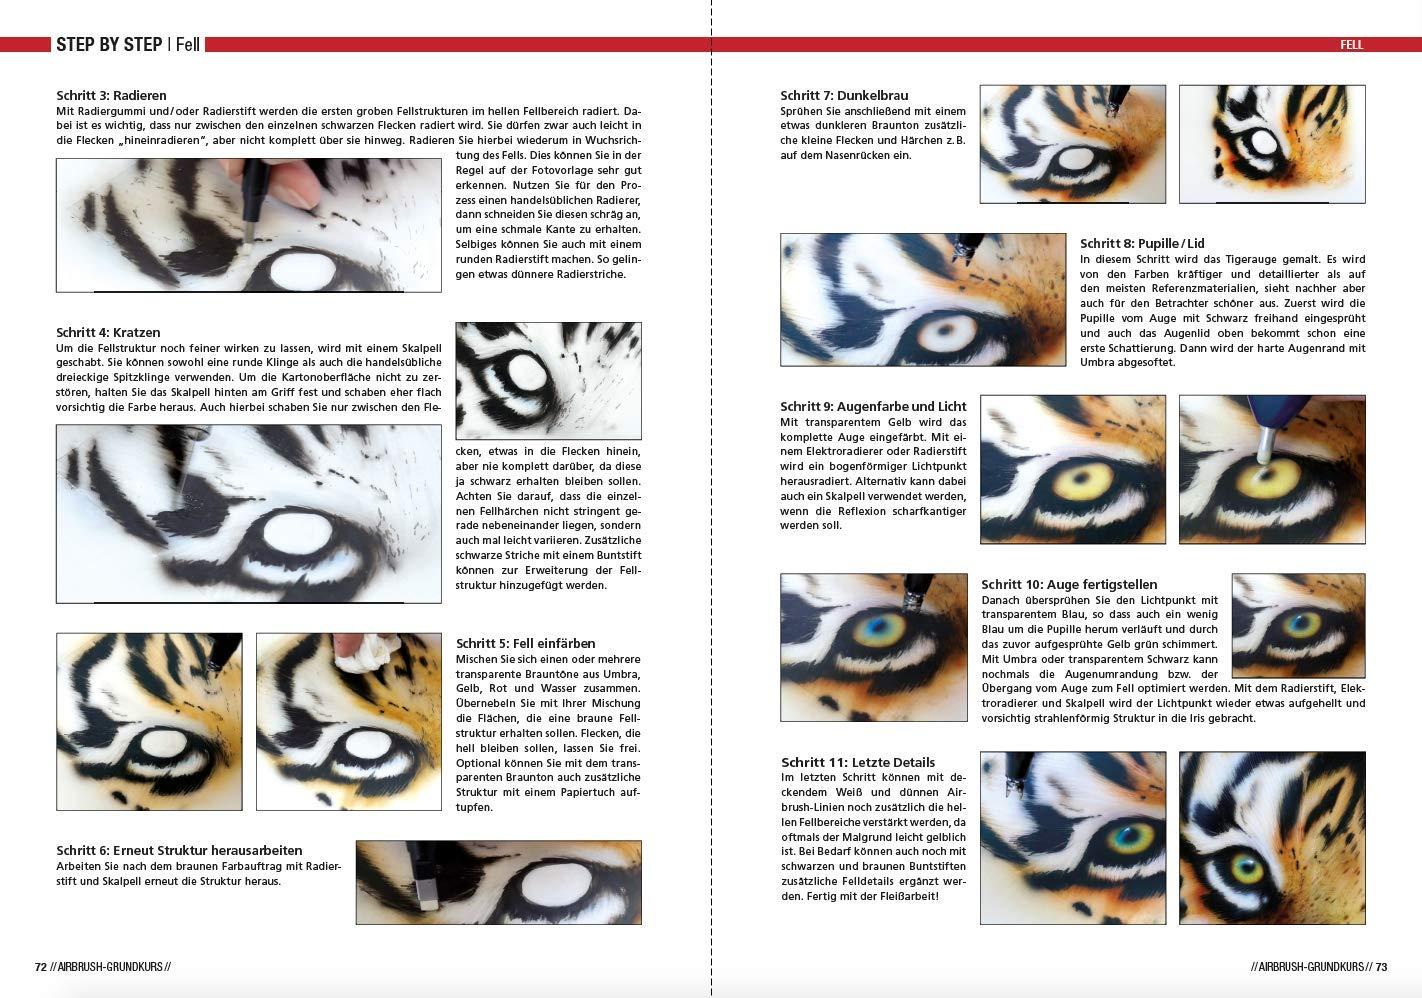 Airbrush-Grundkurs: Das Einsteigerhandbuch: Amazon.es: Hassler, Roger: Libros en idiomas extranjeros